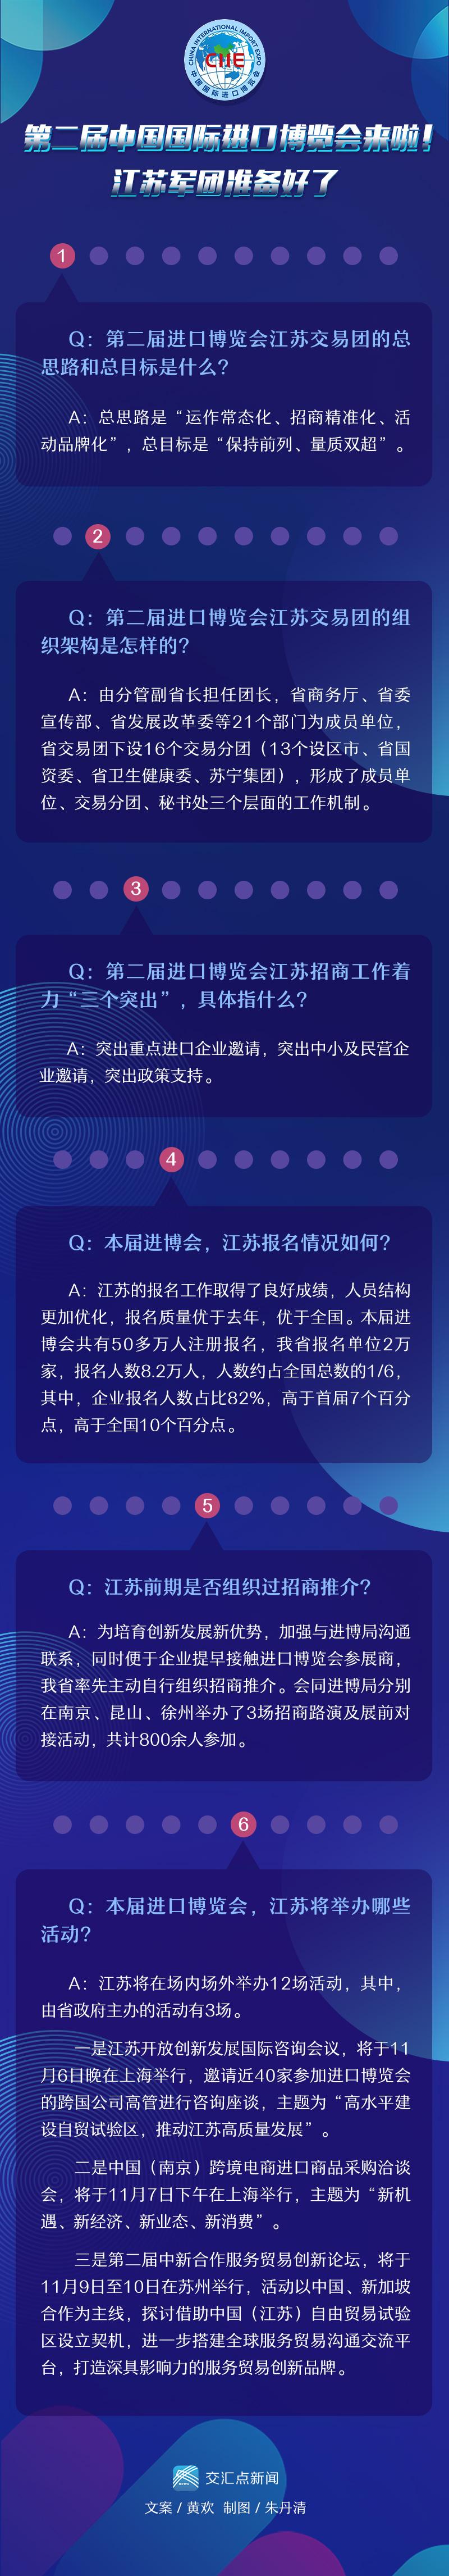 http://www.nthuaimage.com/nantongjingji/29156.html